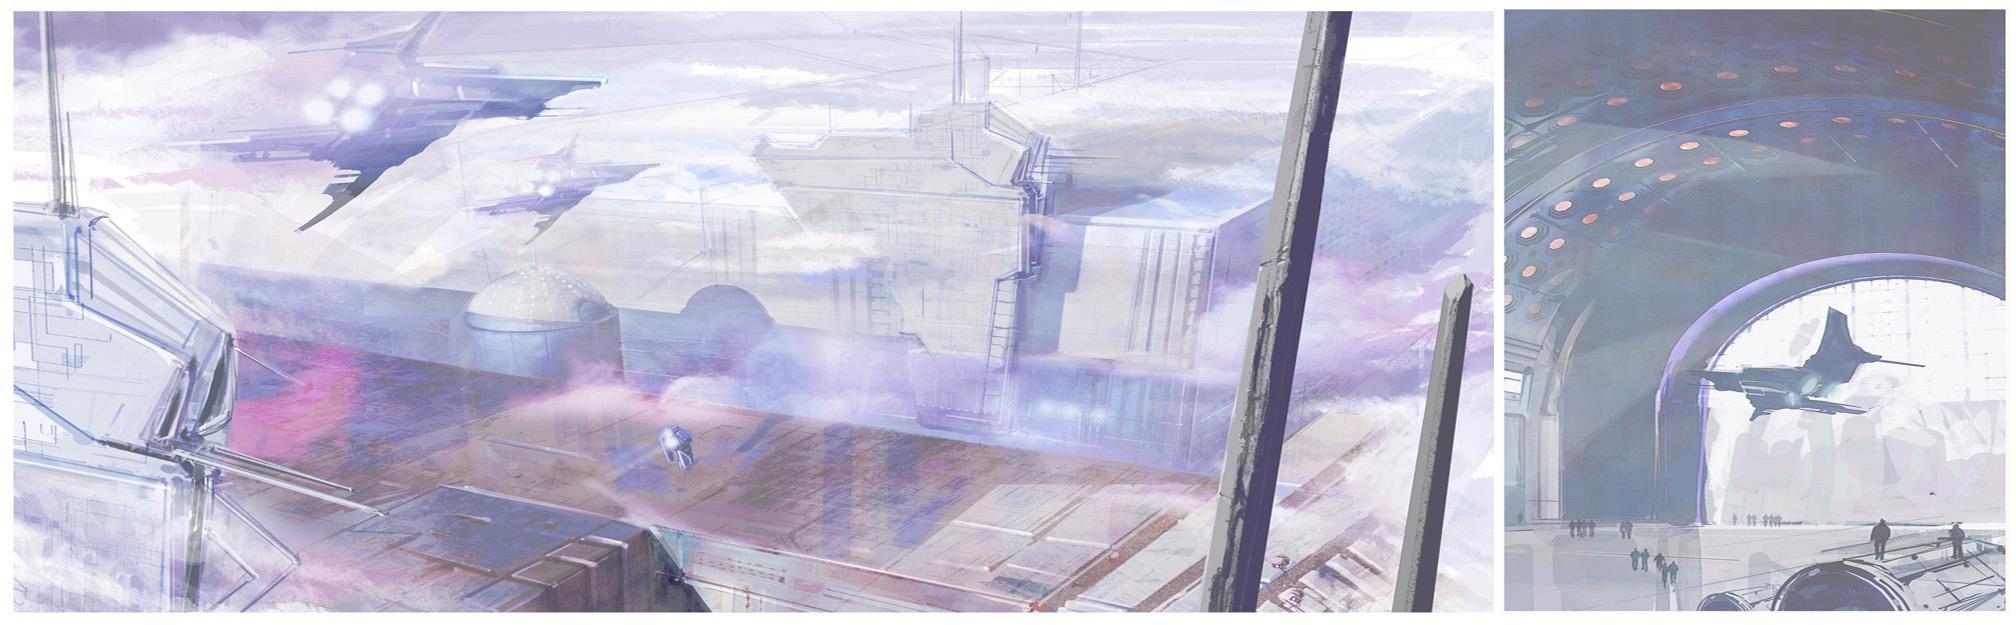 Genesis - modern city